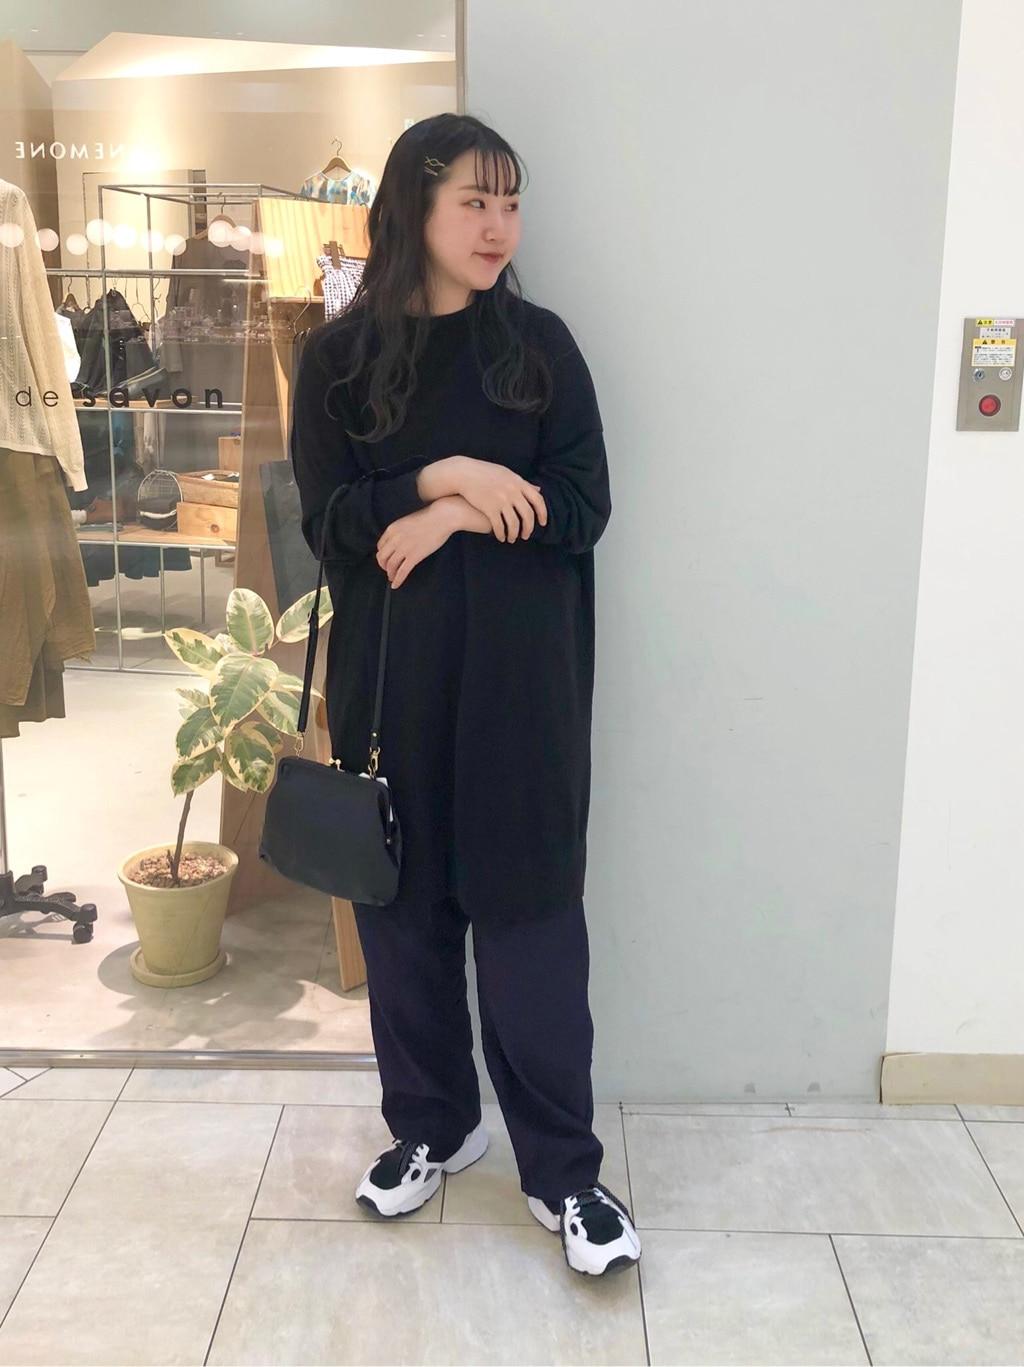 bulle de savon 阪急西宮ガーデンズ 身長:166cm 2020.06.13